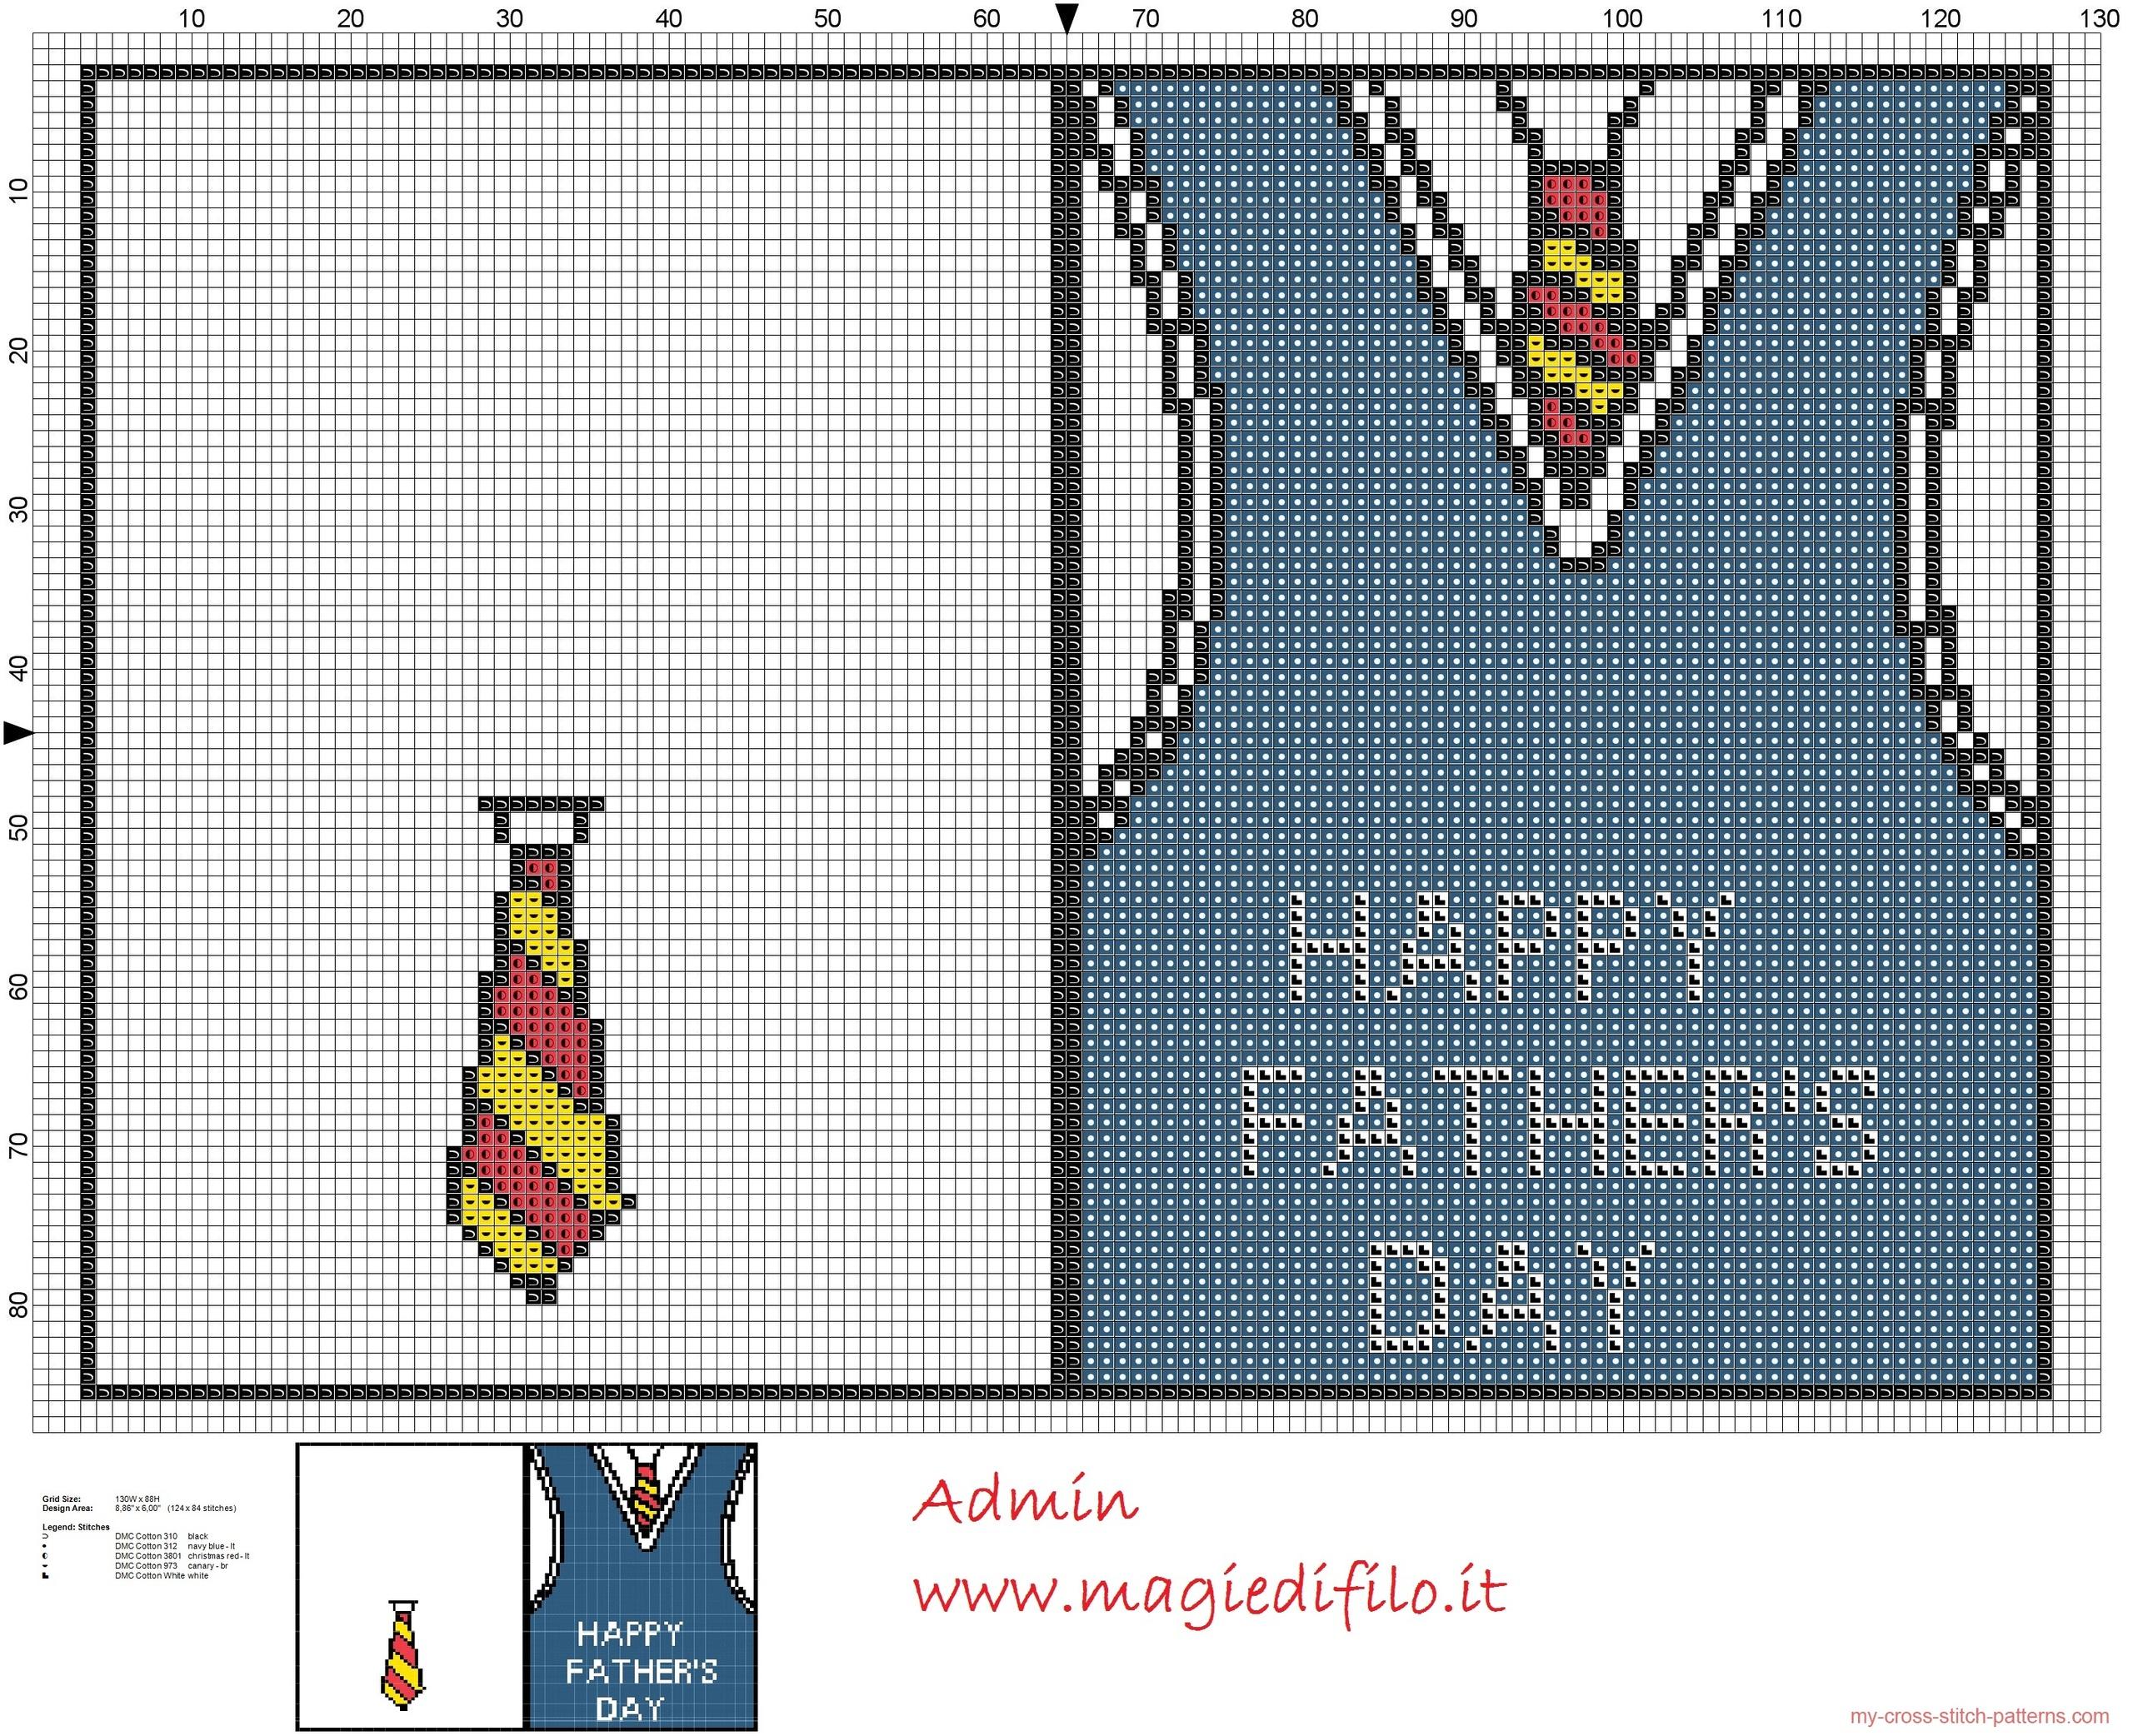 card_happy_fathers_day_cross_stitch_pattern